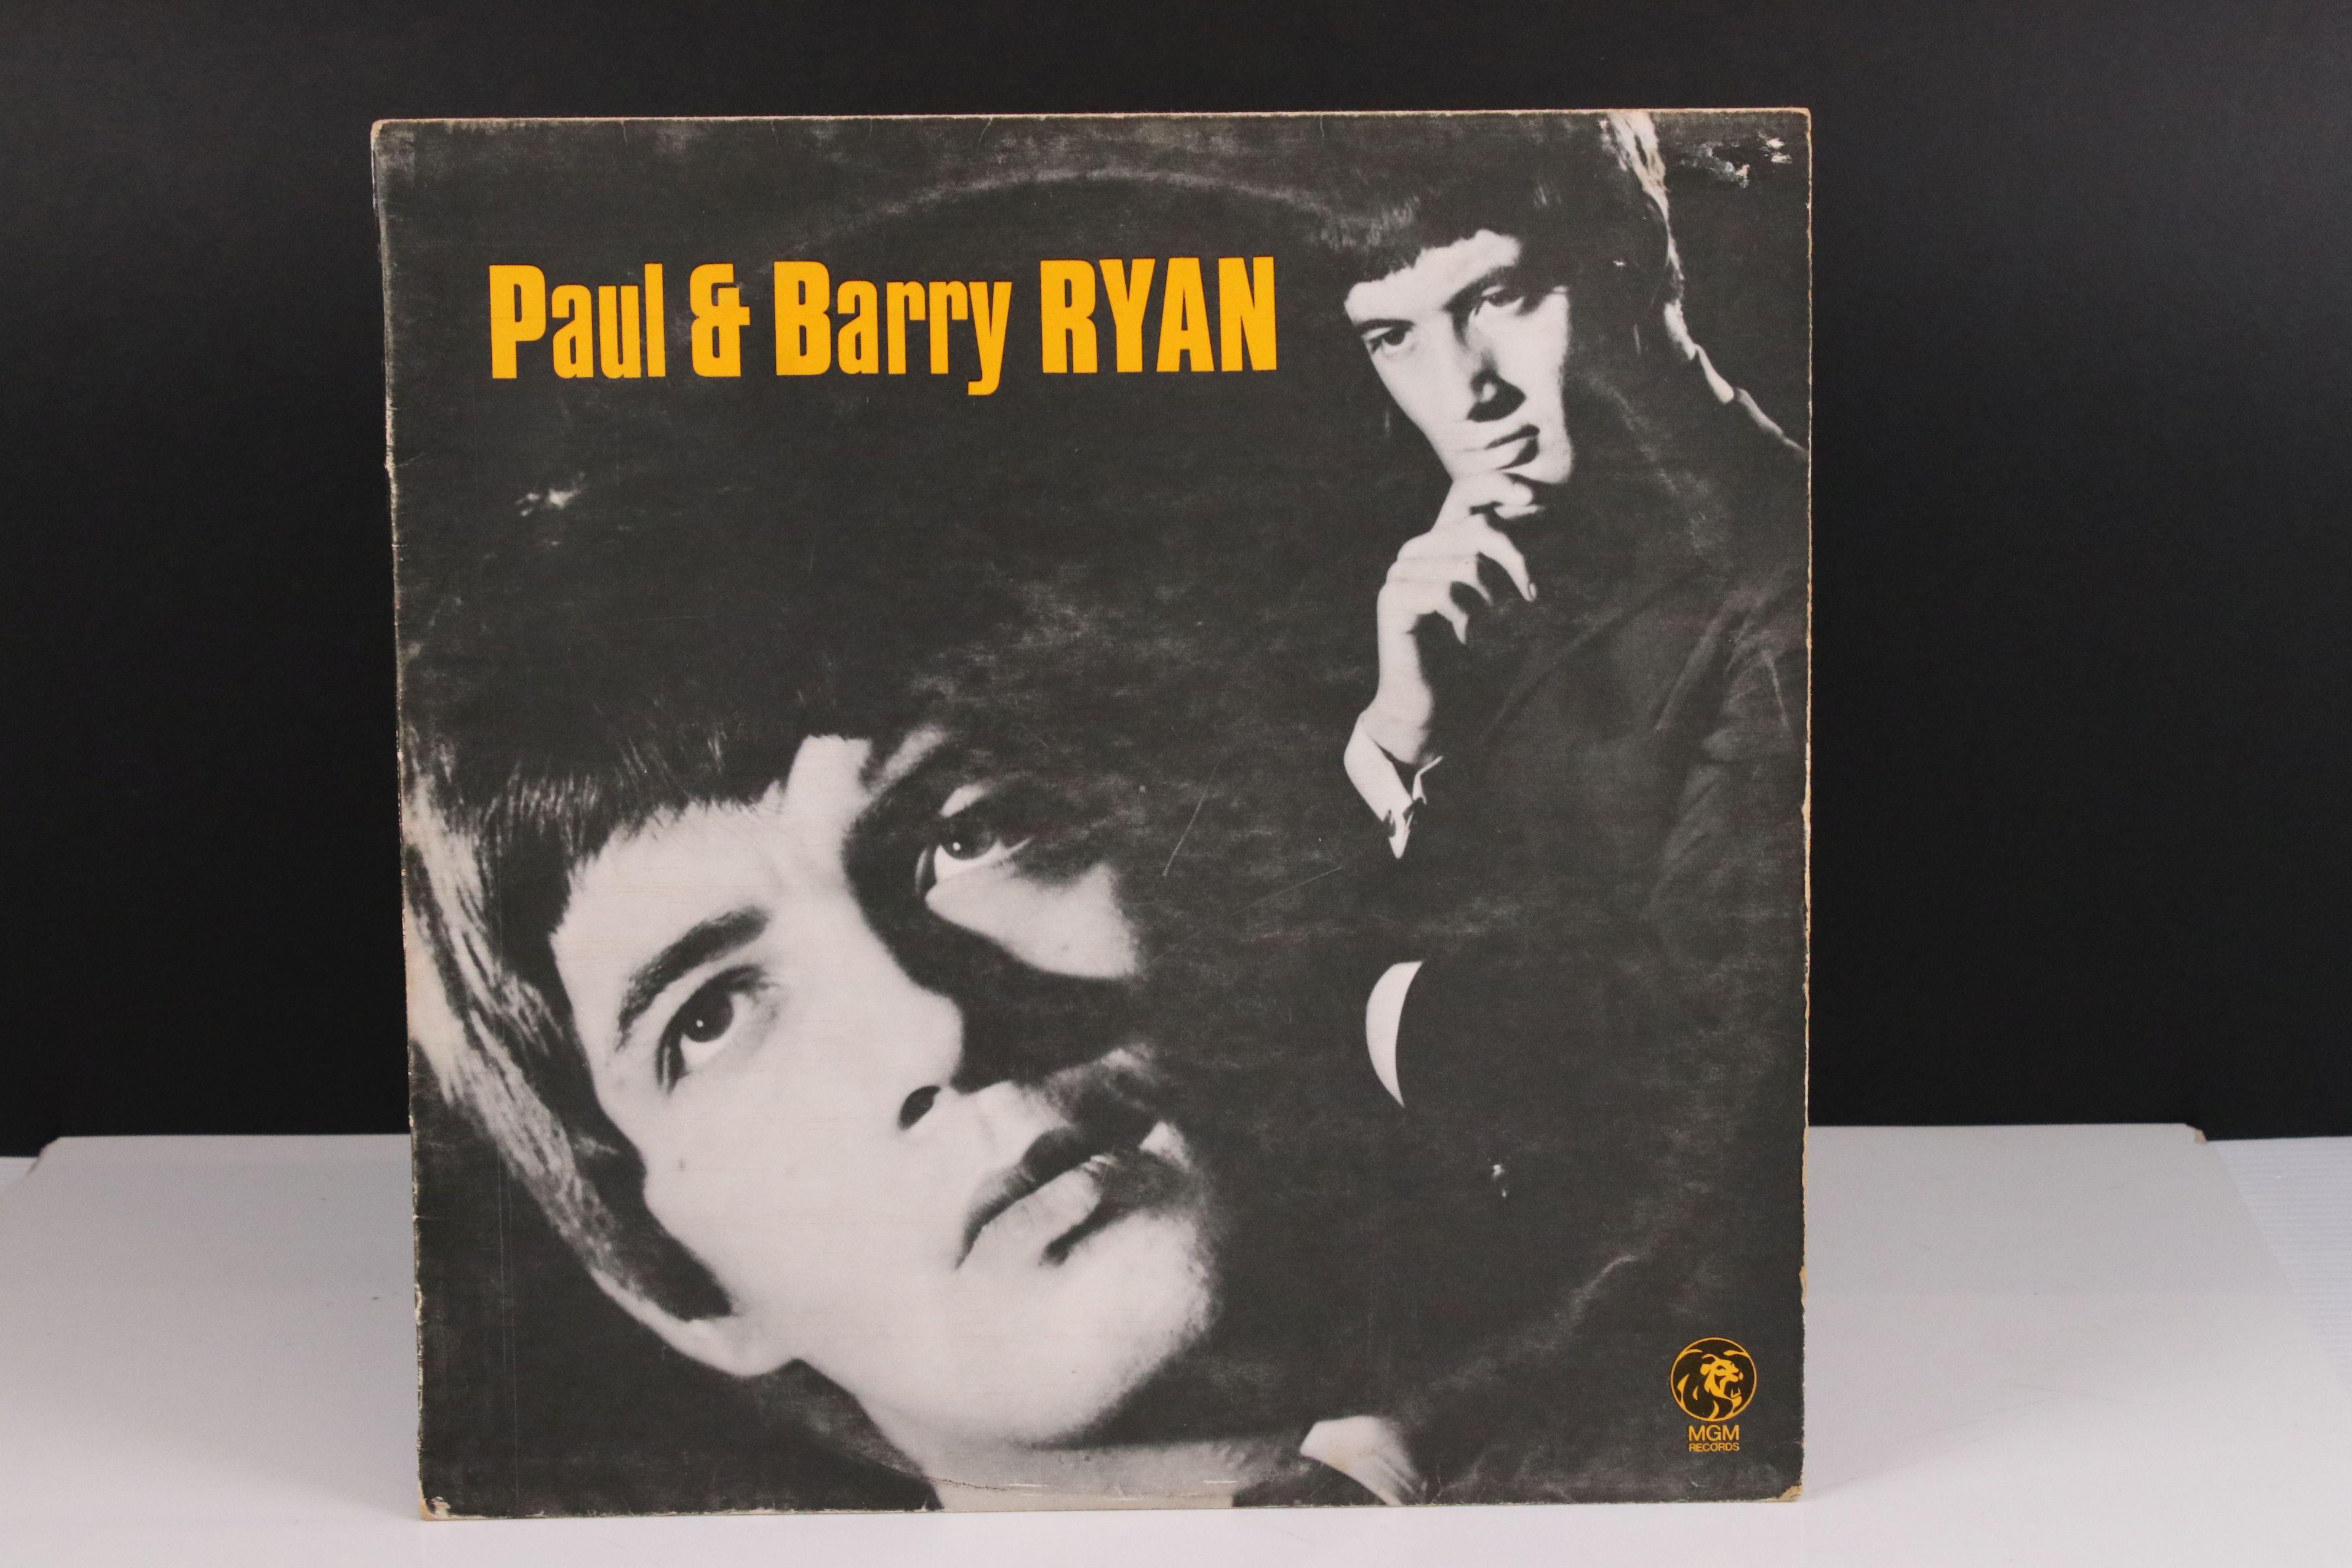 Vinyl - MOD/BEAT Paul & Barry Ryan self titled LP on MGM C 8081, mono non laminated, flip back